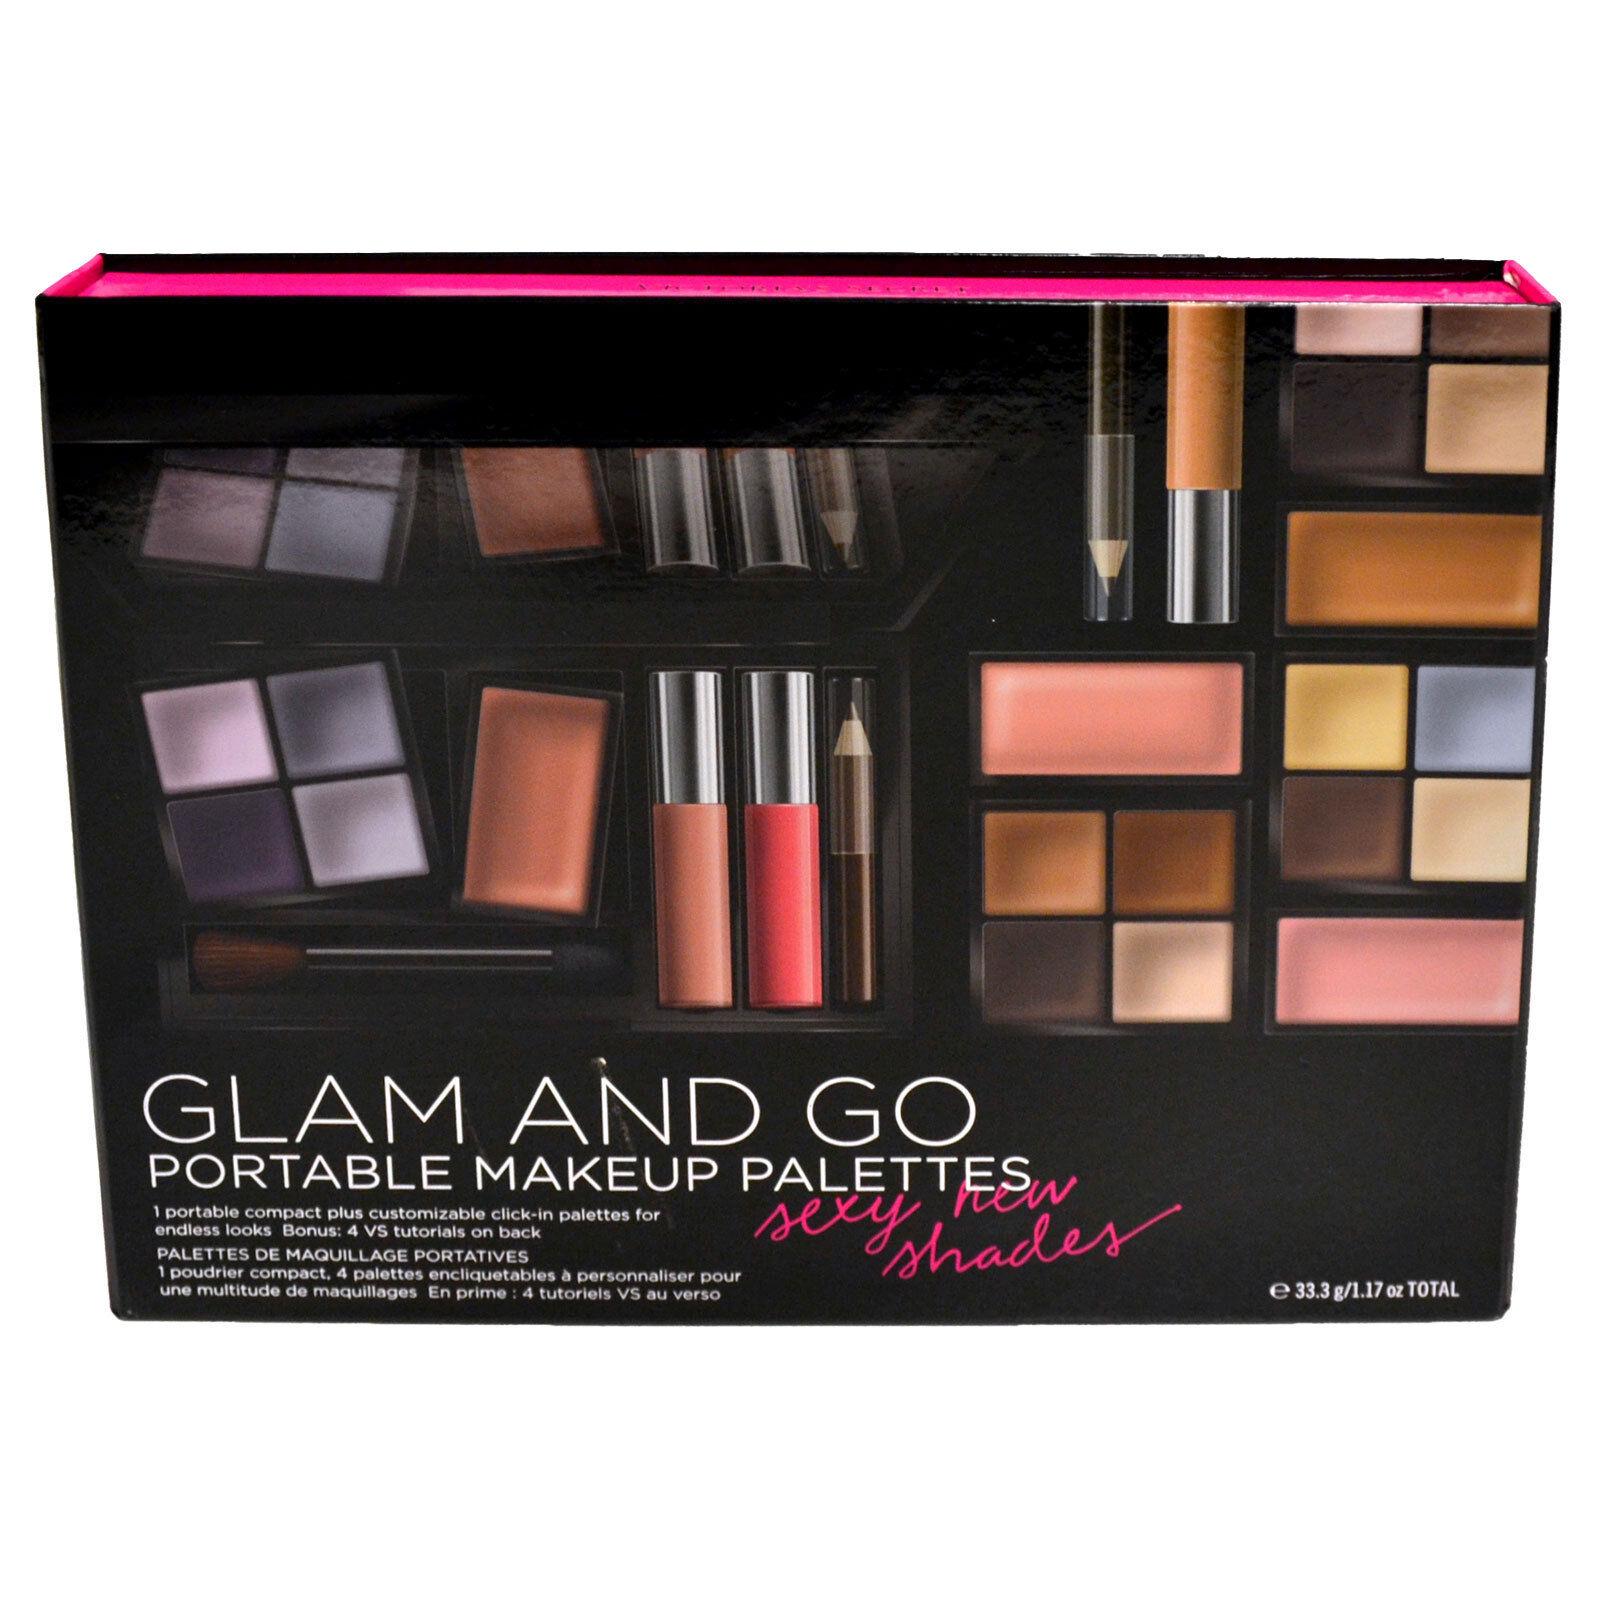 victoria's secret makeup kit g... Image 1